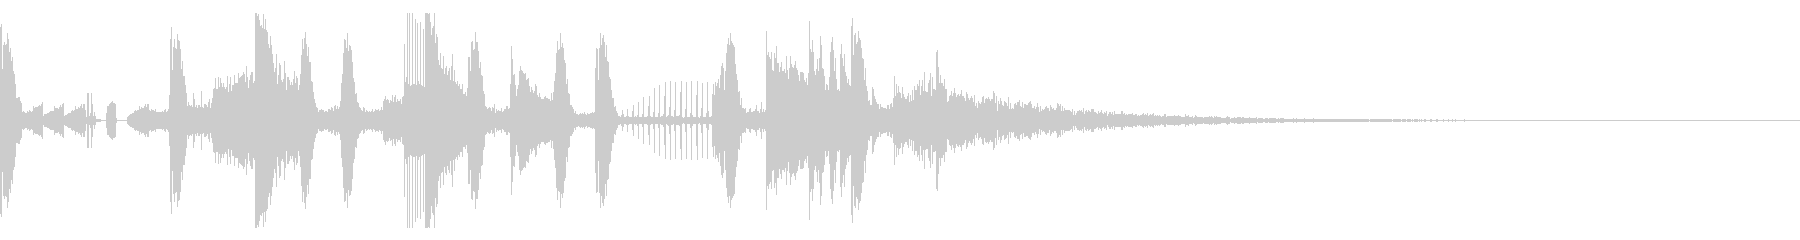 140 BPMの未再生の波形